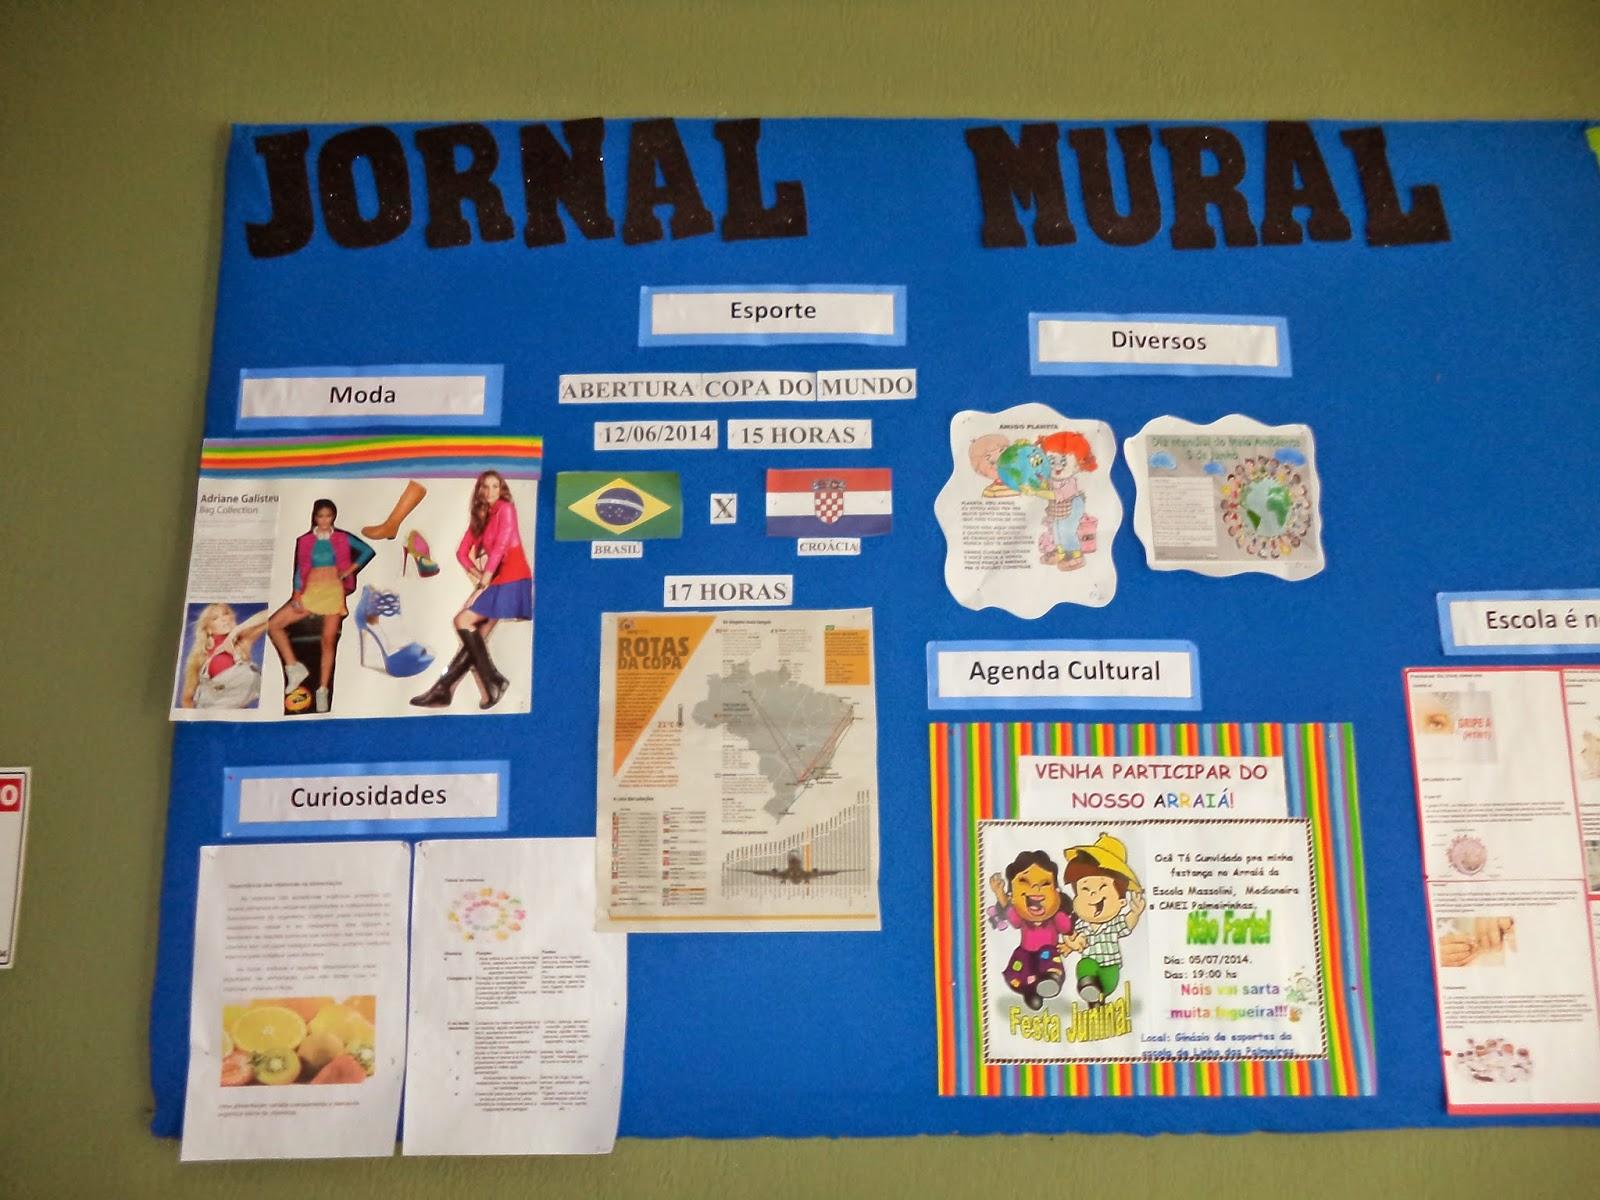 E e f d massolini jornal mural estudantil for Componentes de un periodico mural